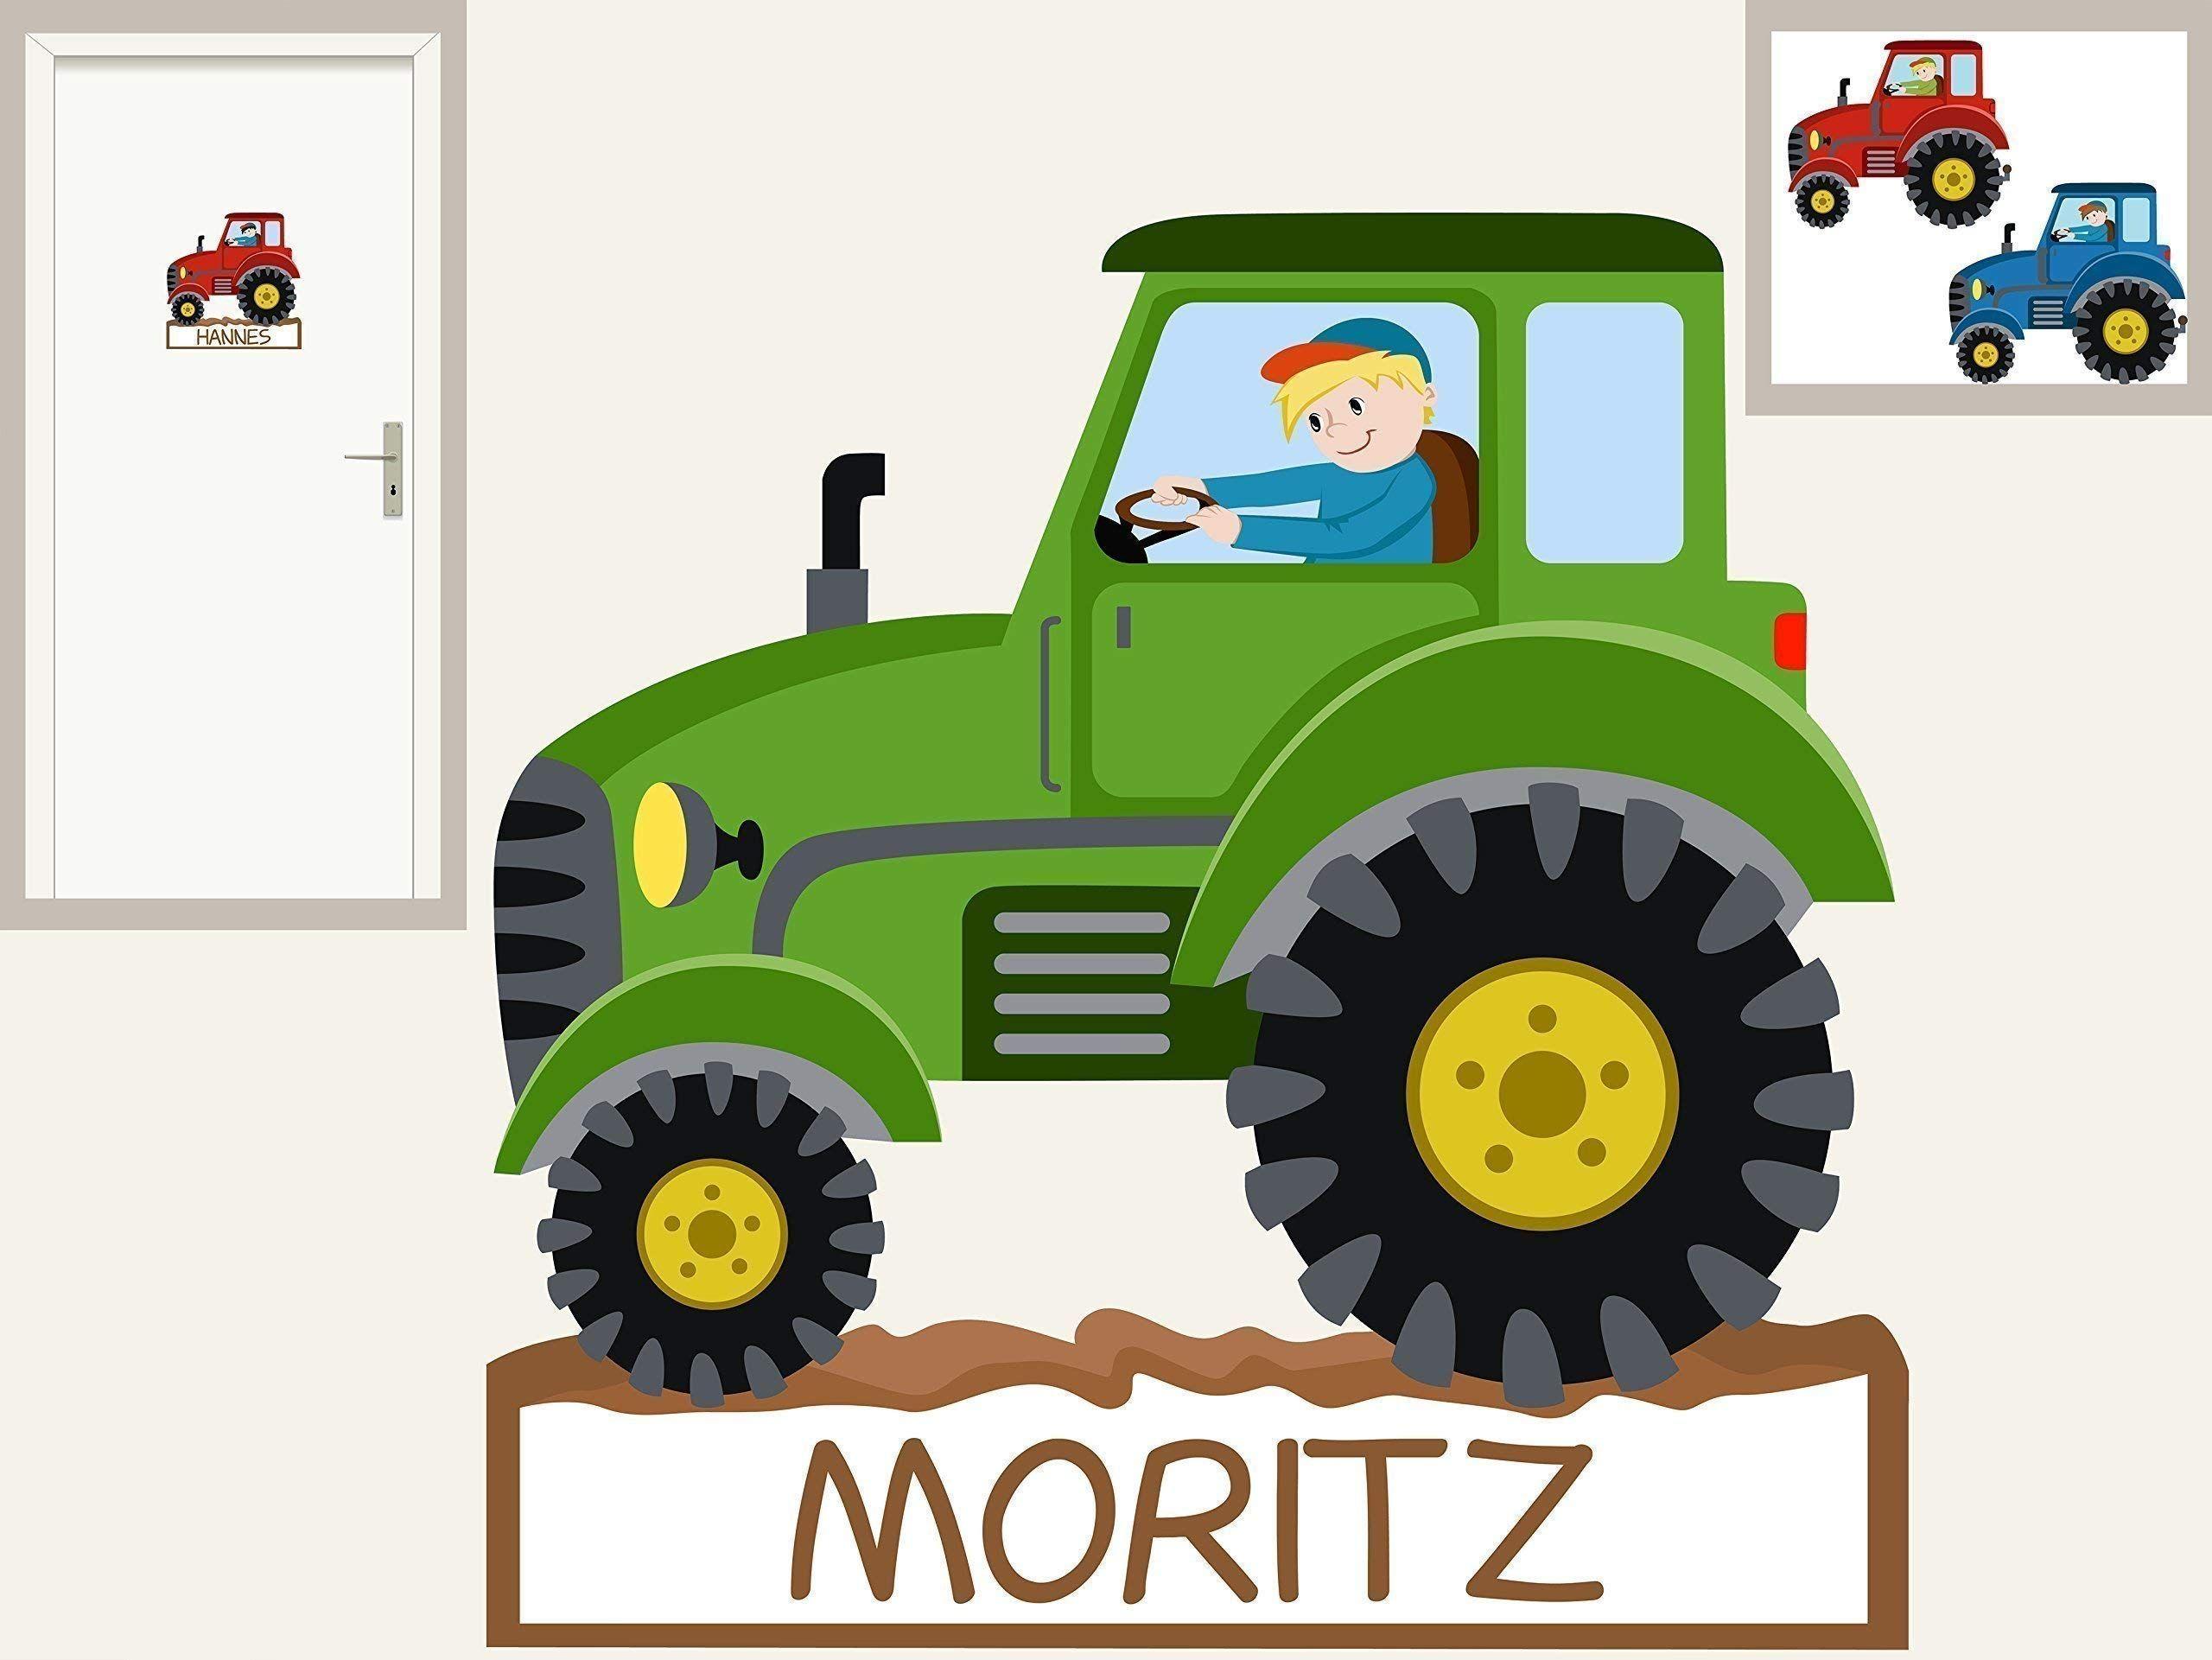 T Rschild Traktor I Personalisierbarer Aufkleber Wandtattoo F R